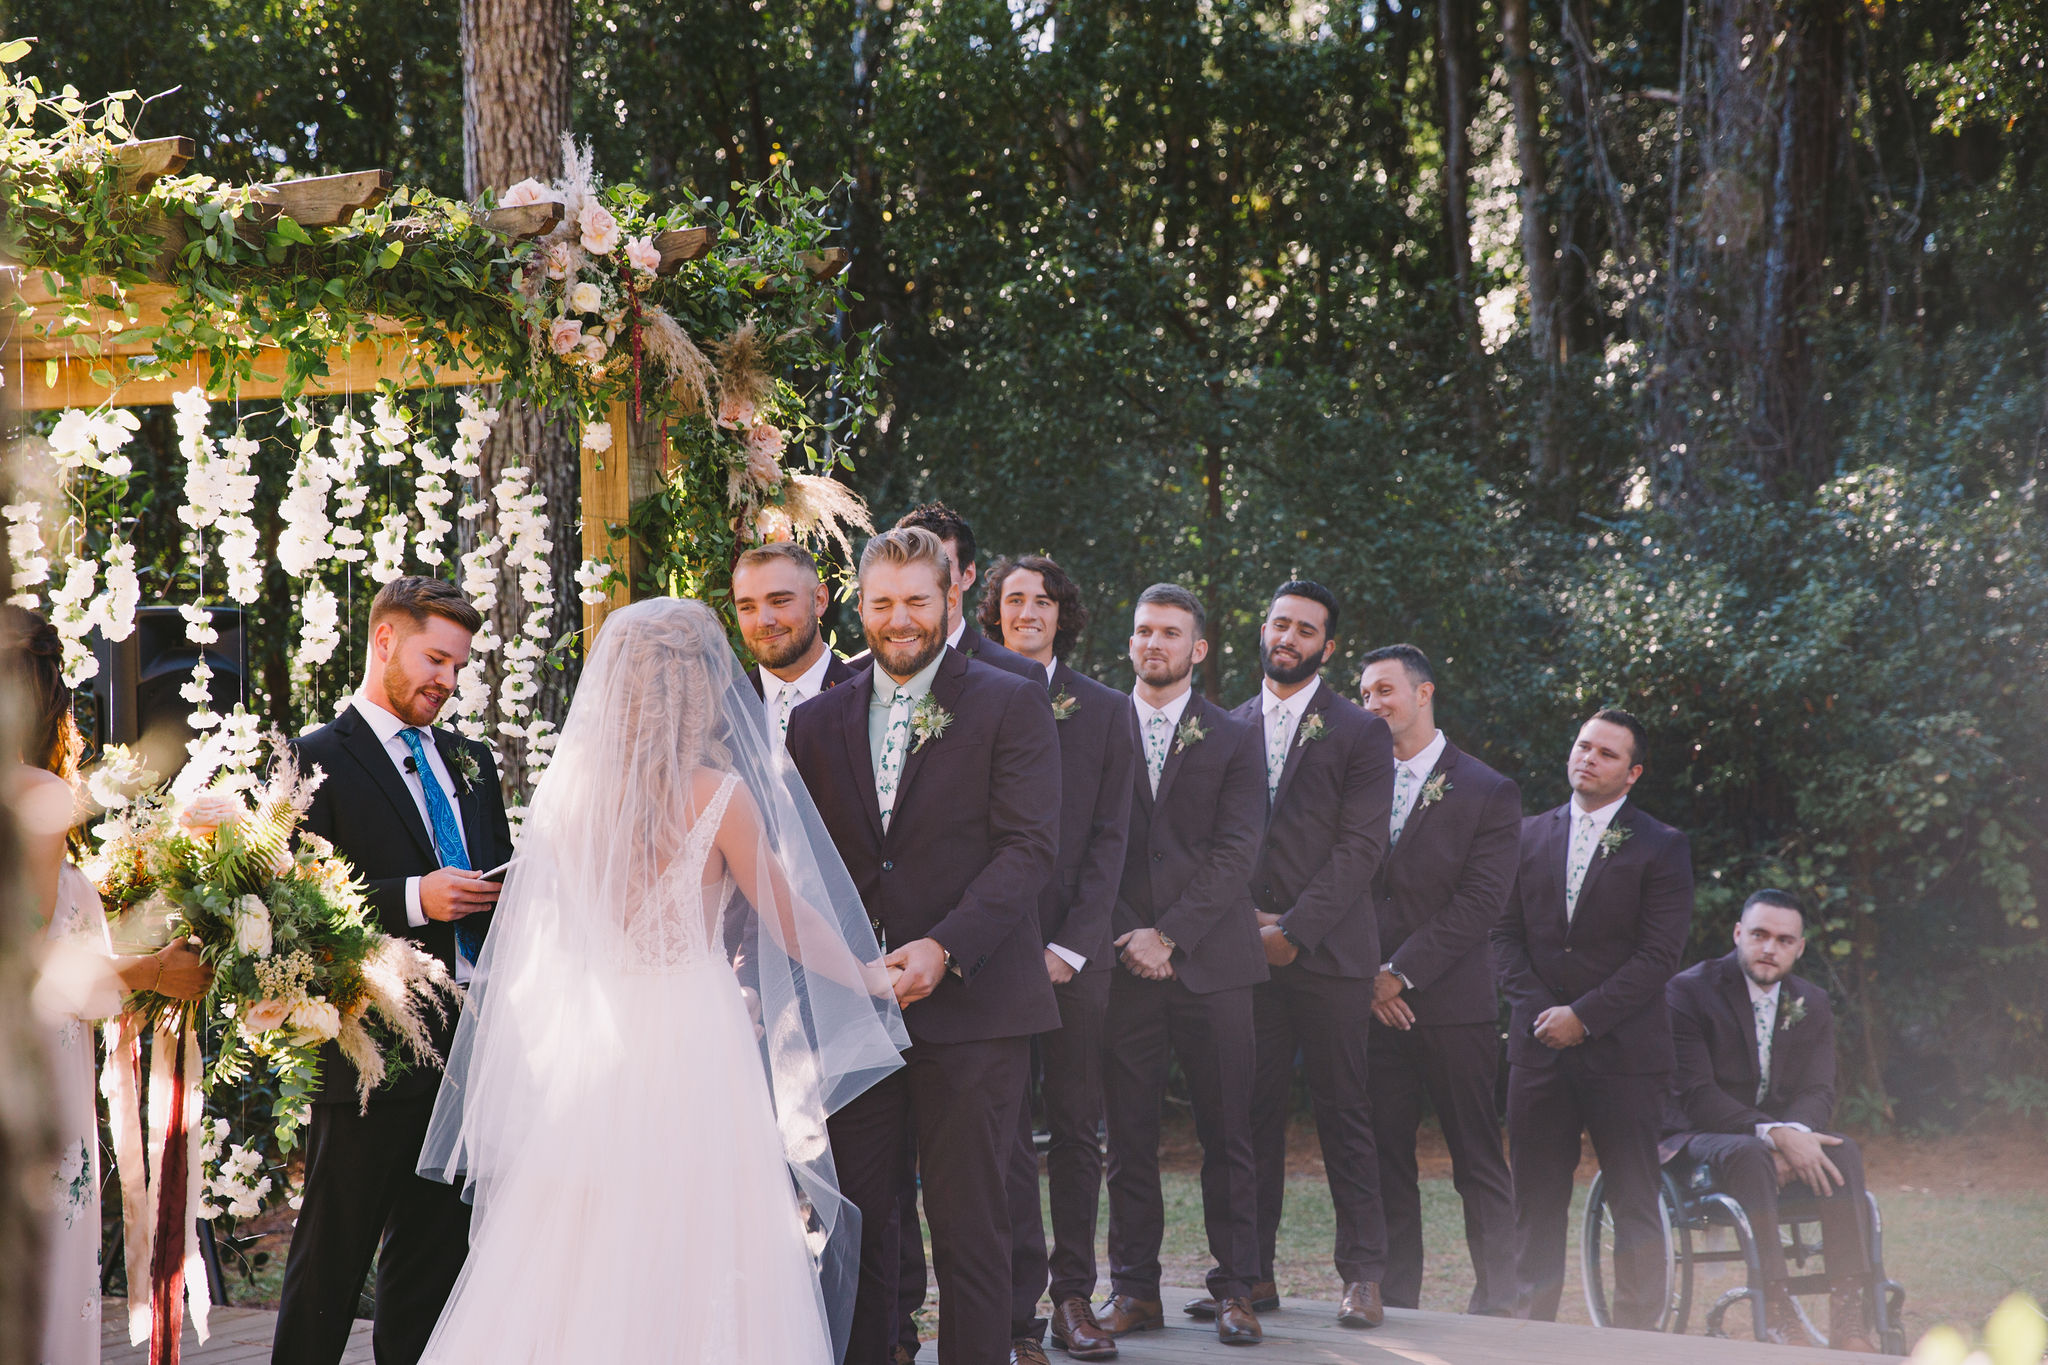 Jesseandlex_181103_AlexisNate_Wedding_Ceremony_140.jpg